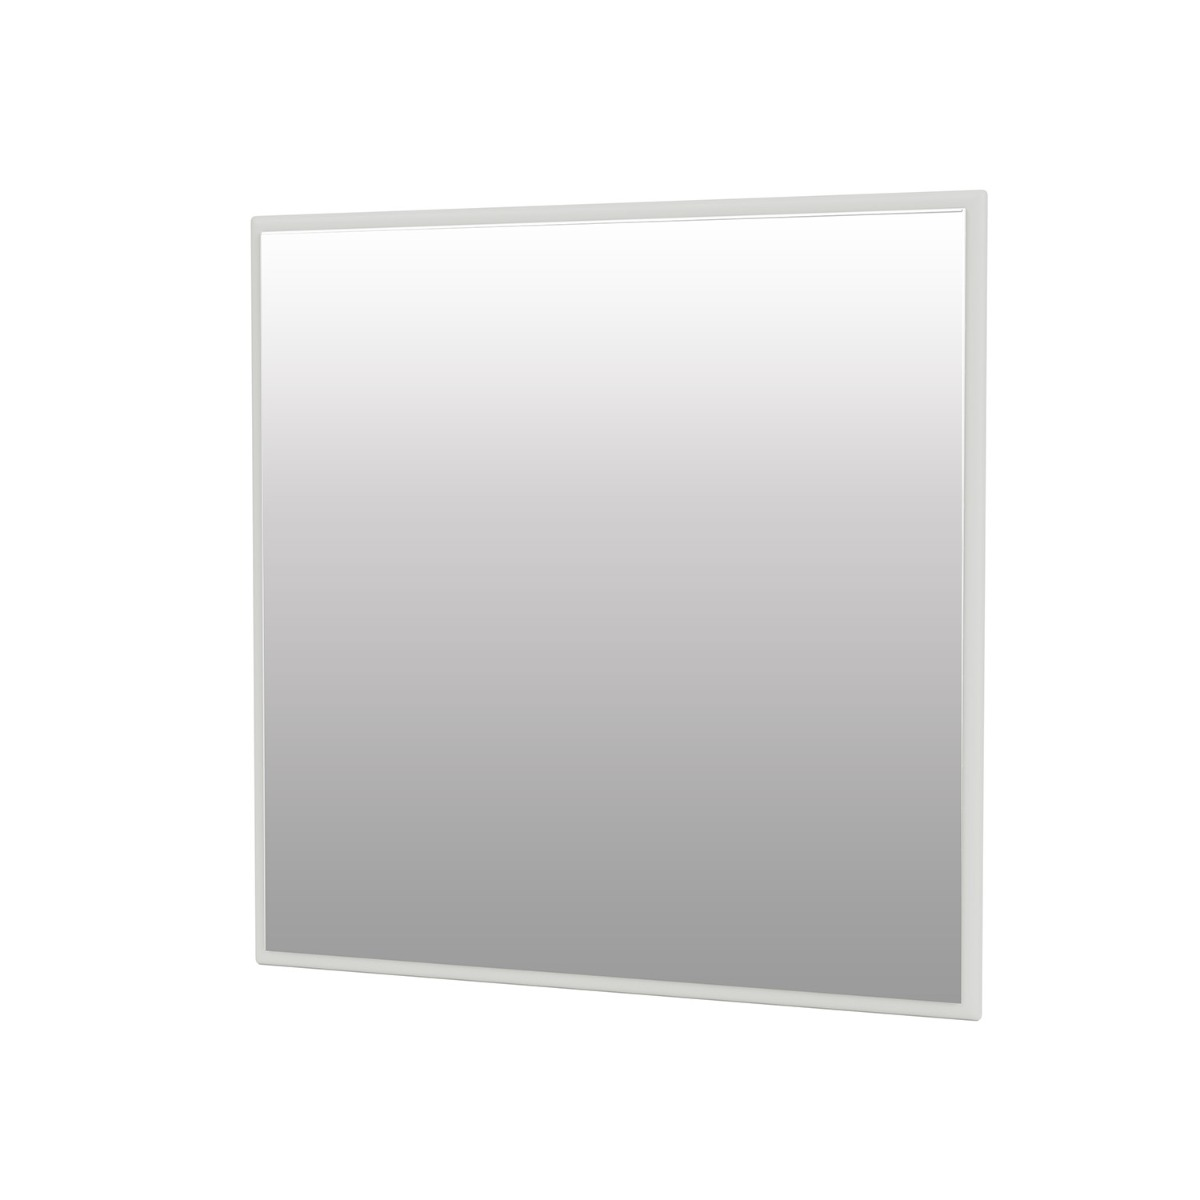 Montana Mini Spegel Fyrkantig 35x35 cm Nordic